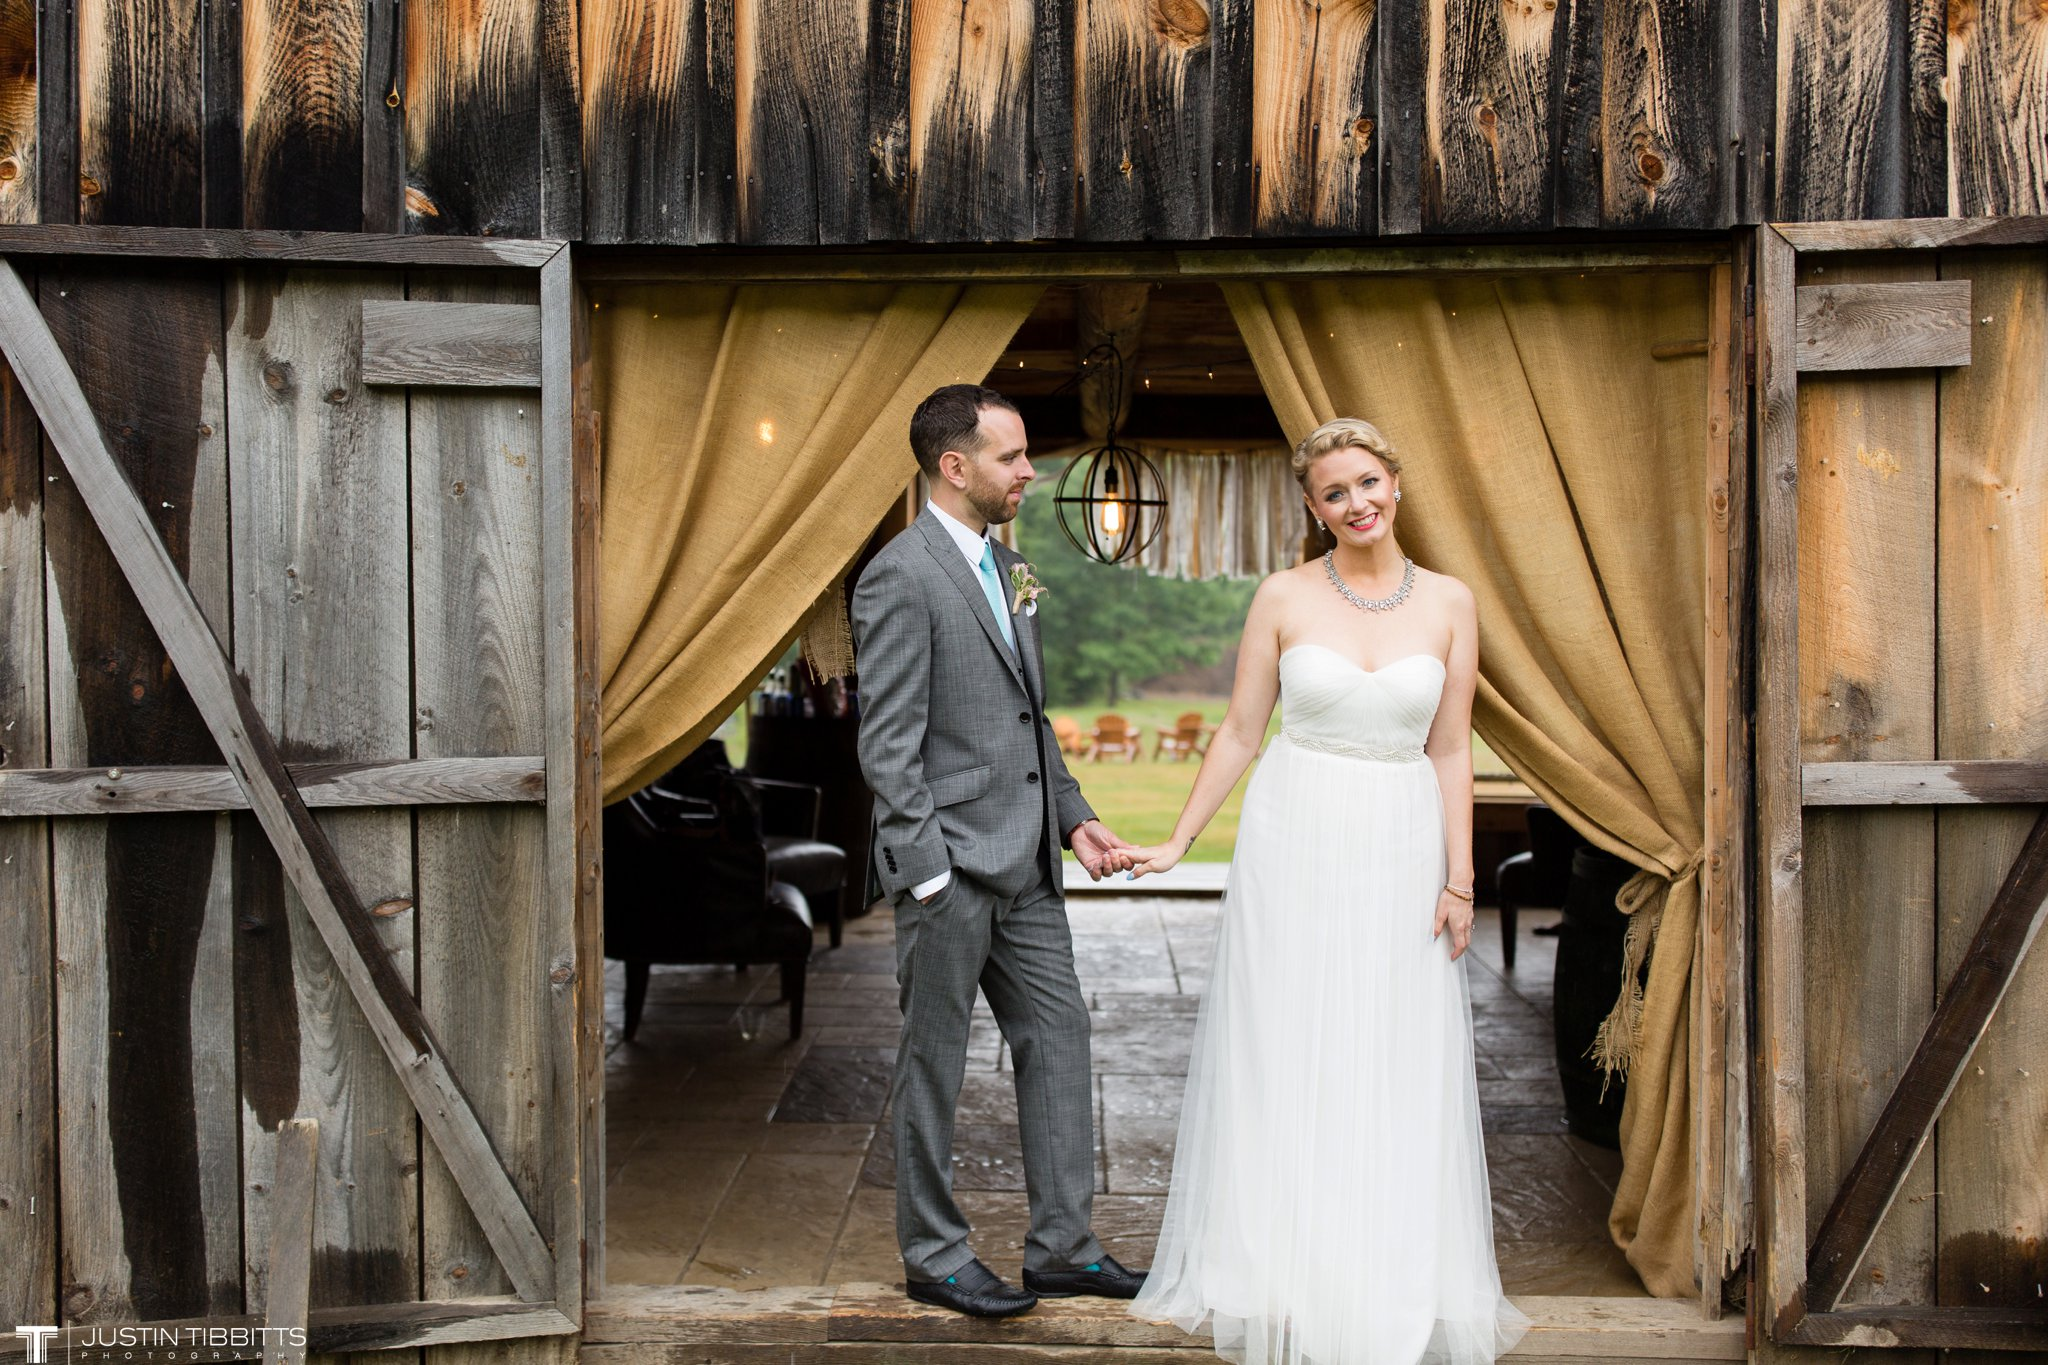 burlap-and-beams-wedding-photos-with-joran-and-molly_0093